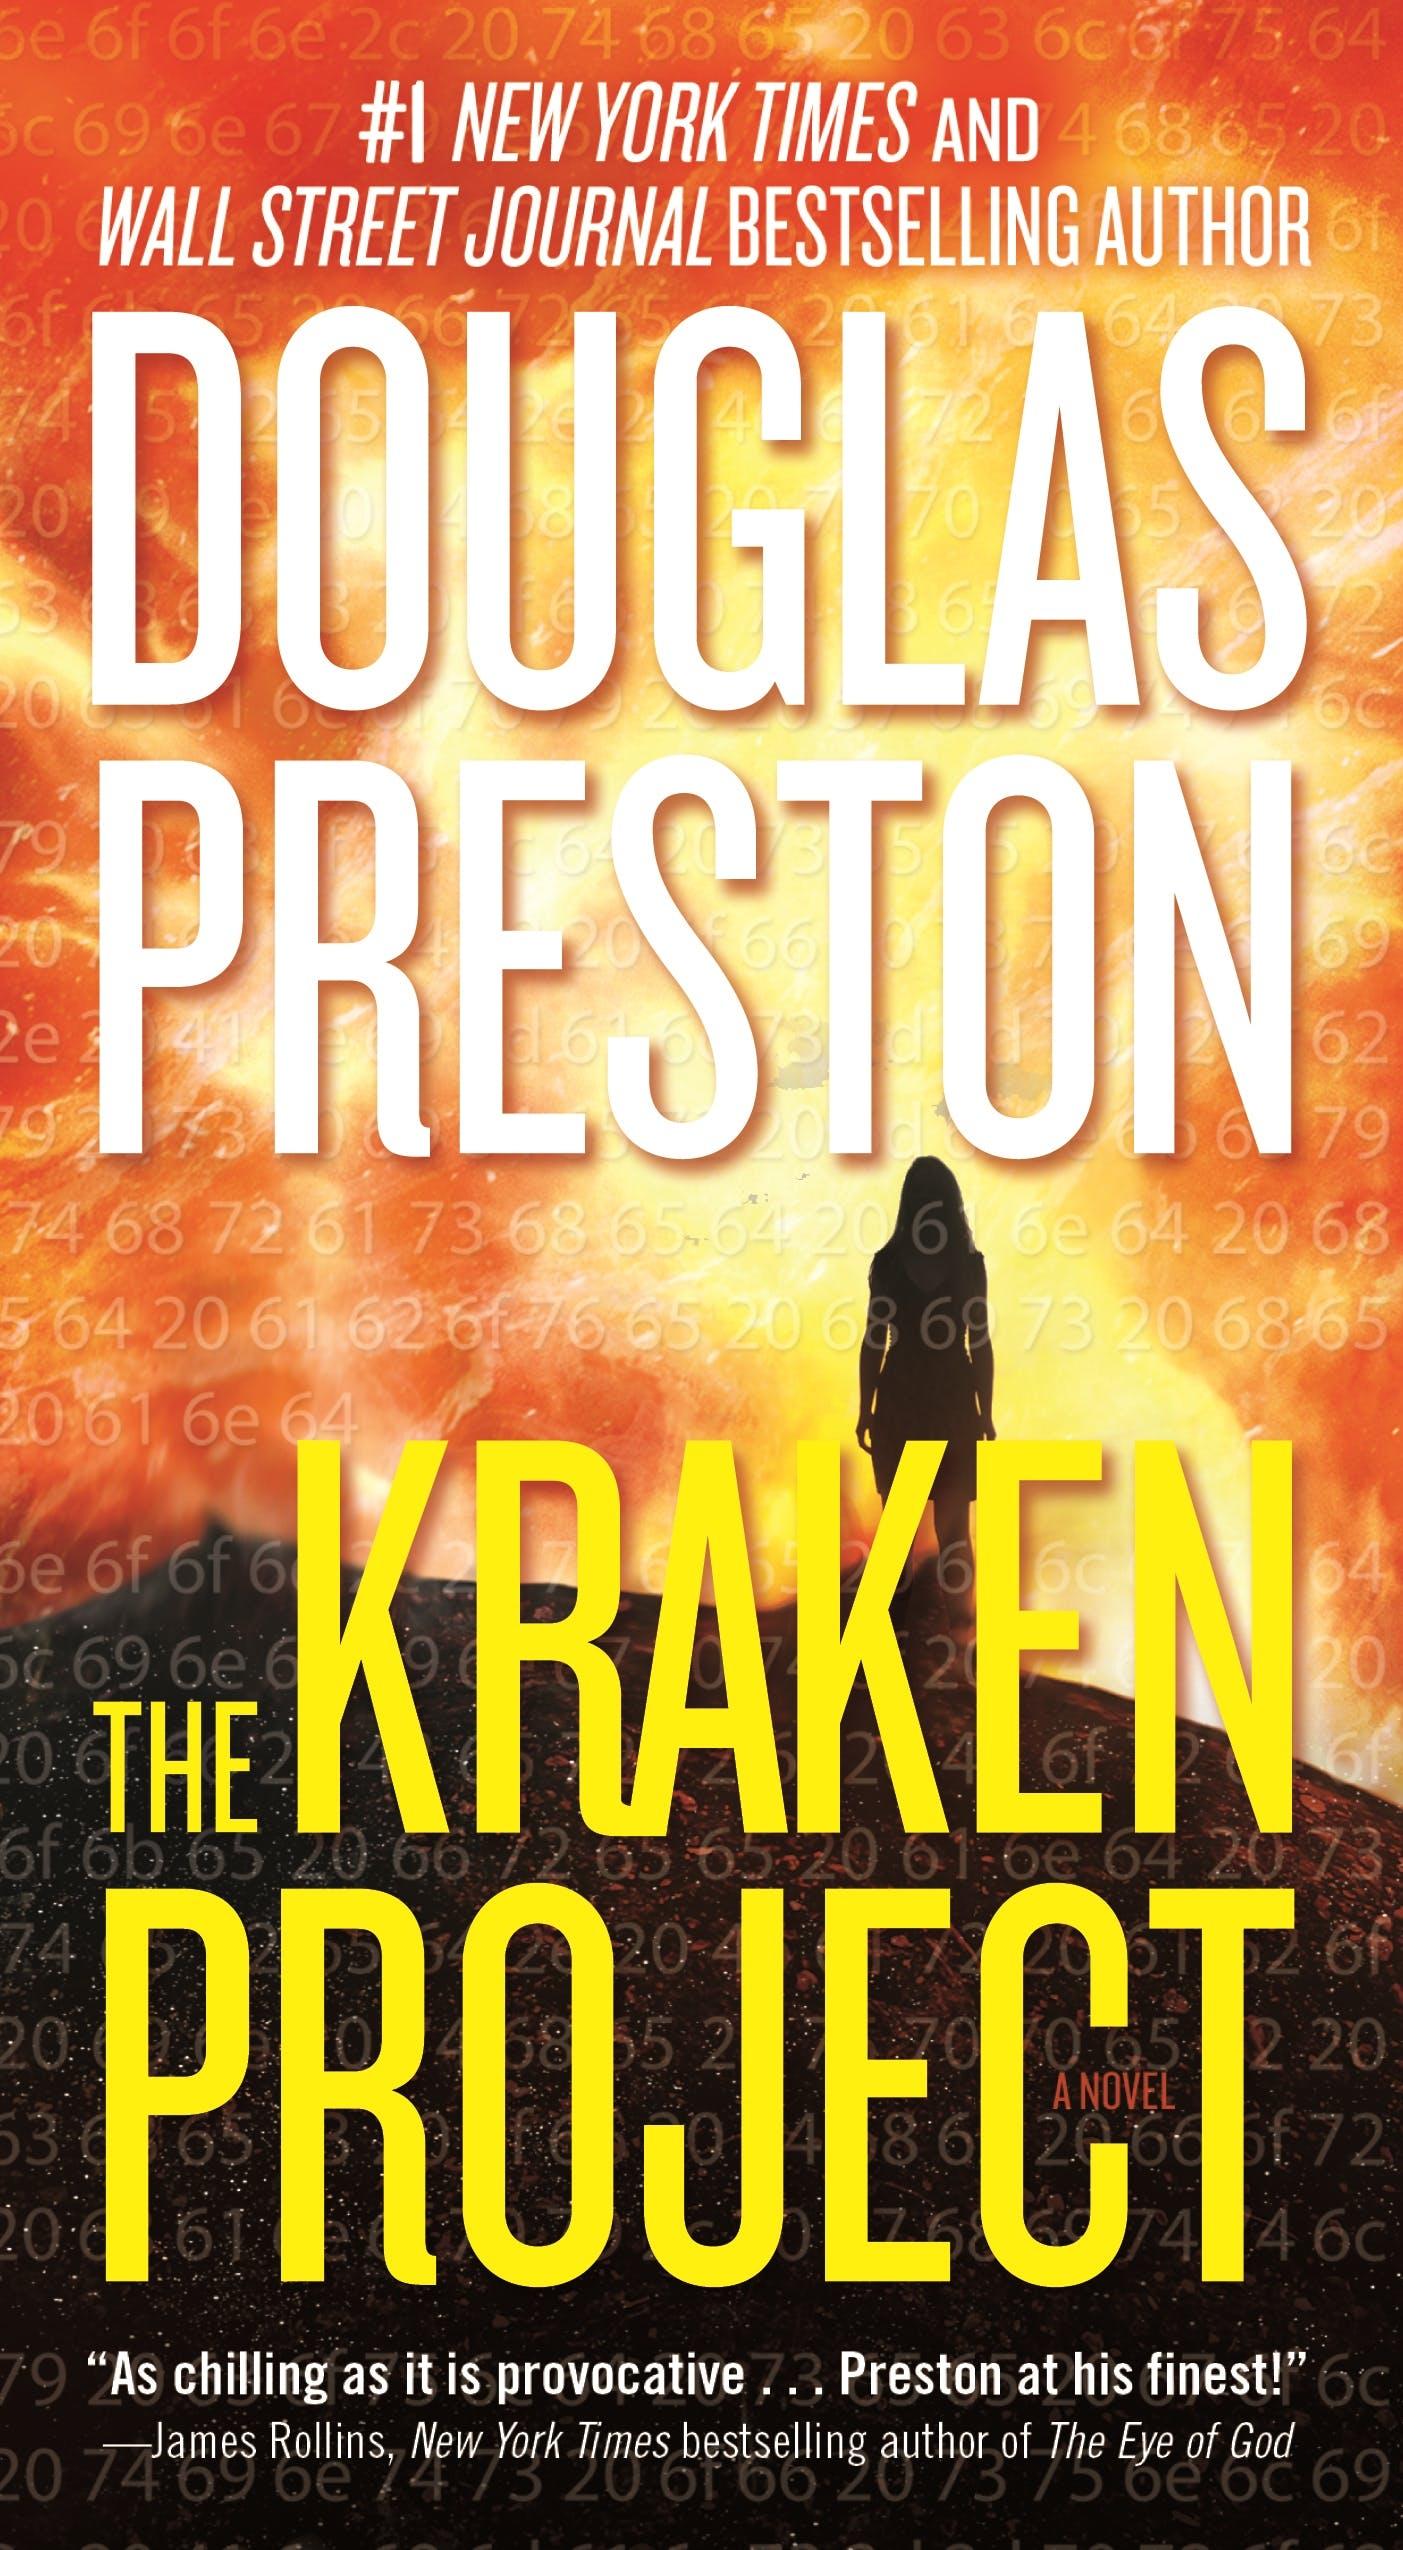 Image of The Kraken Project